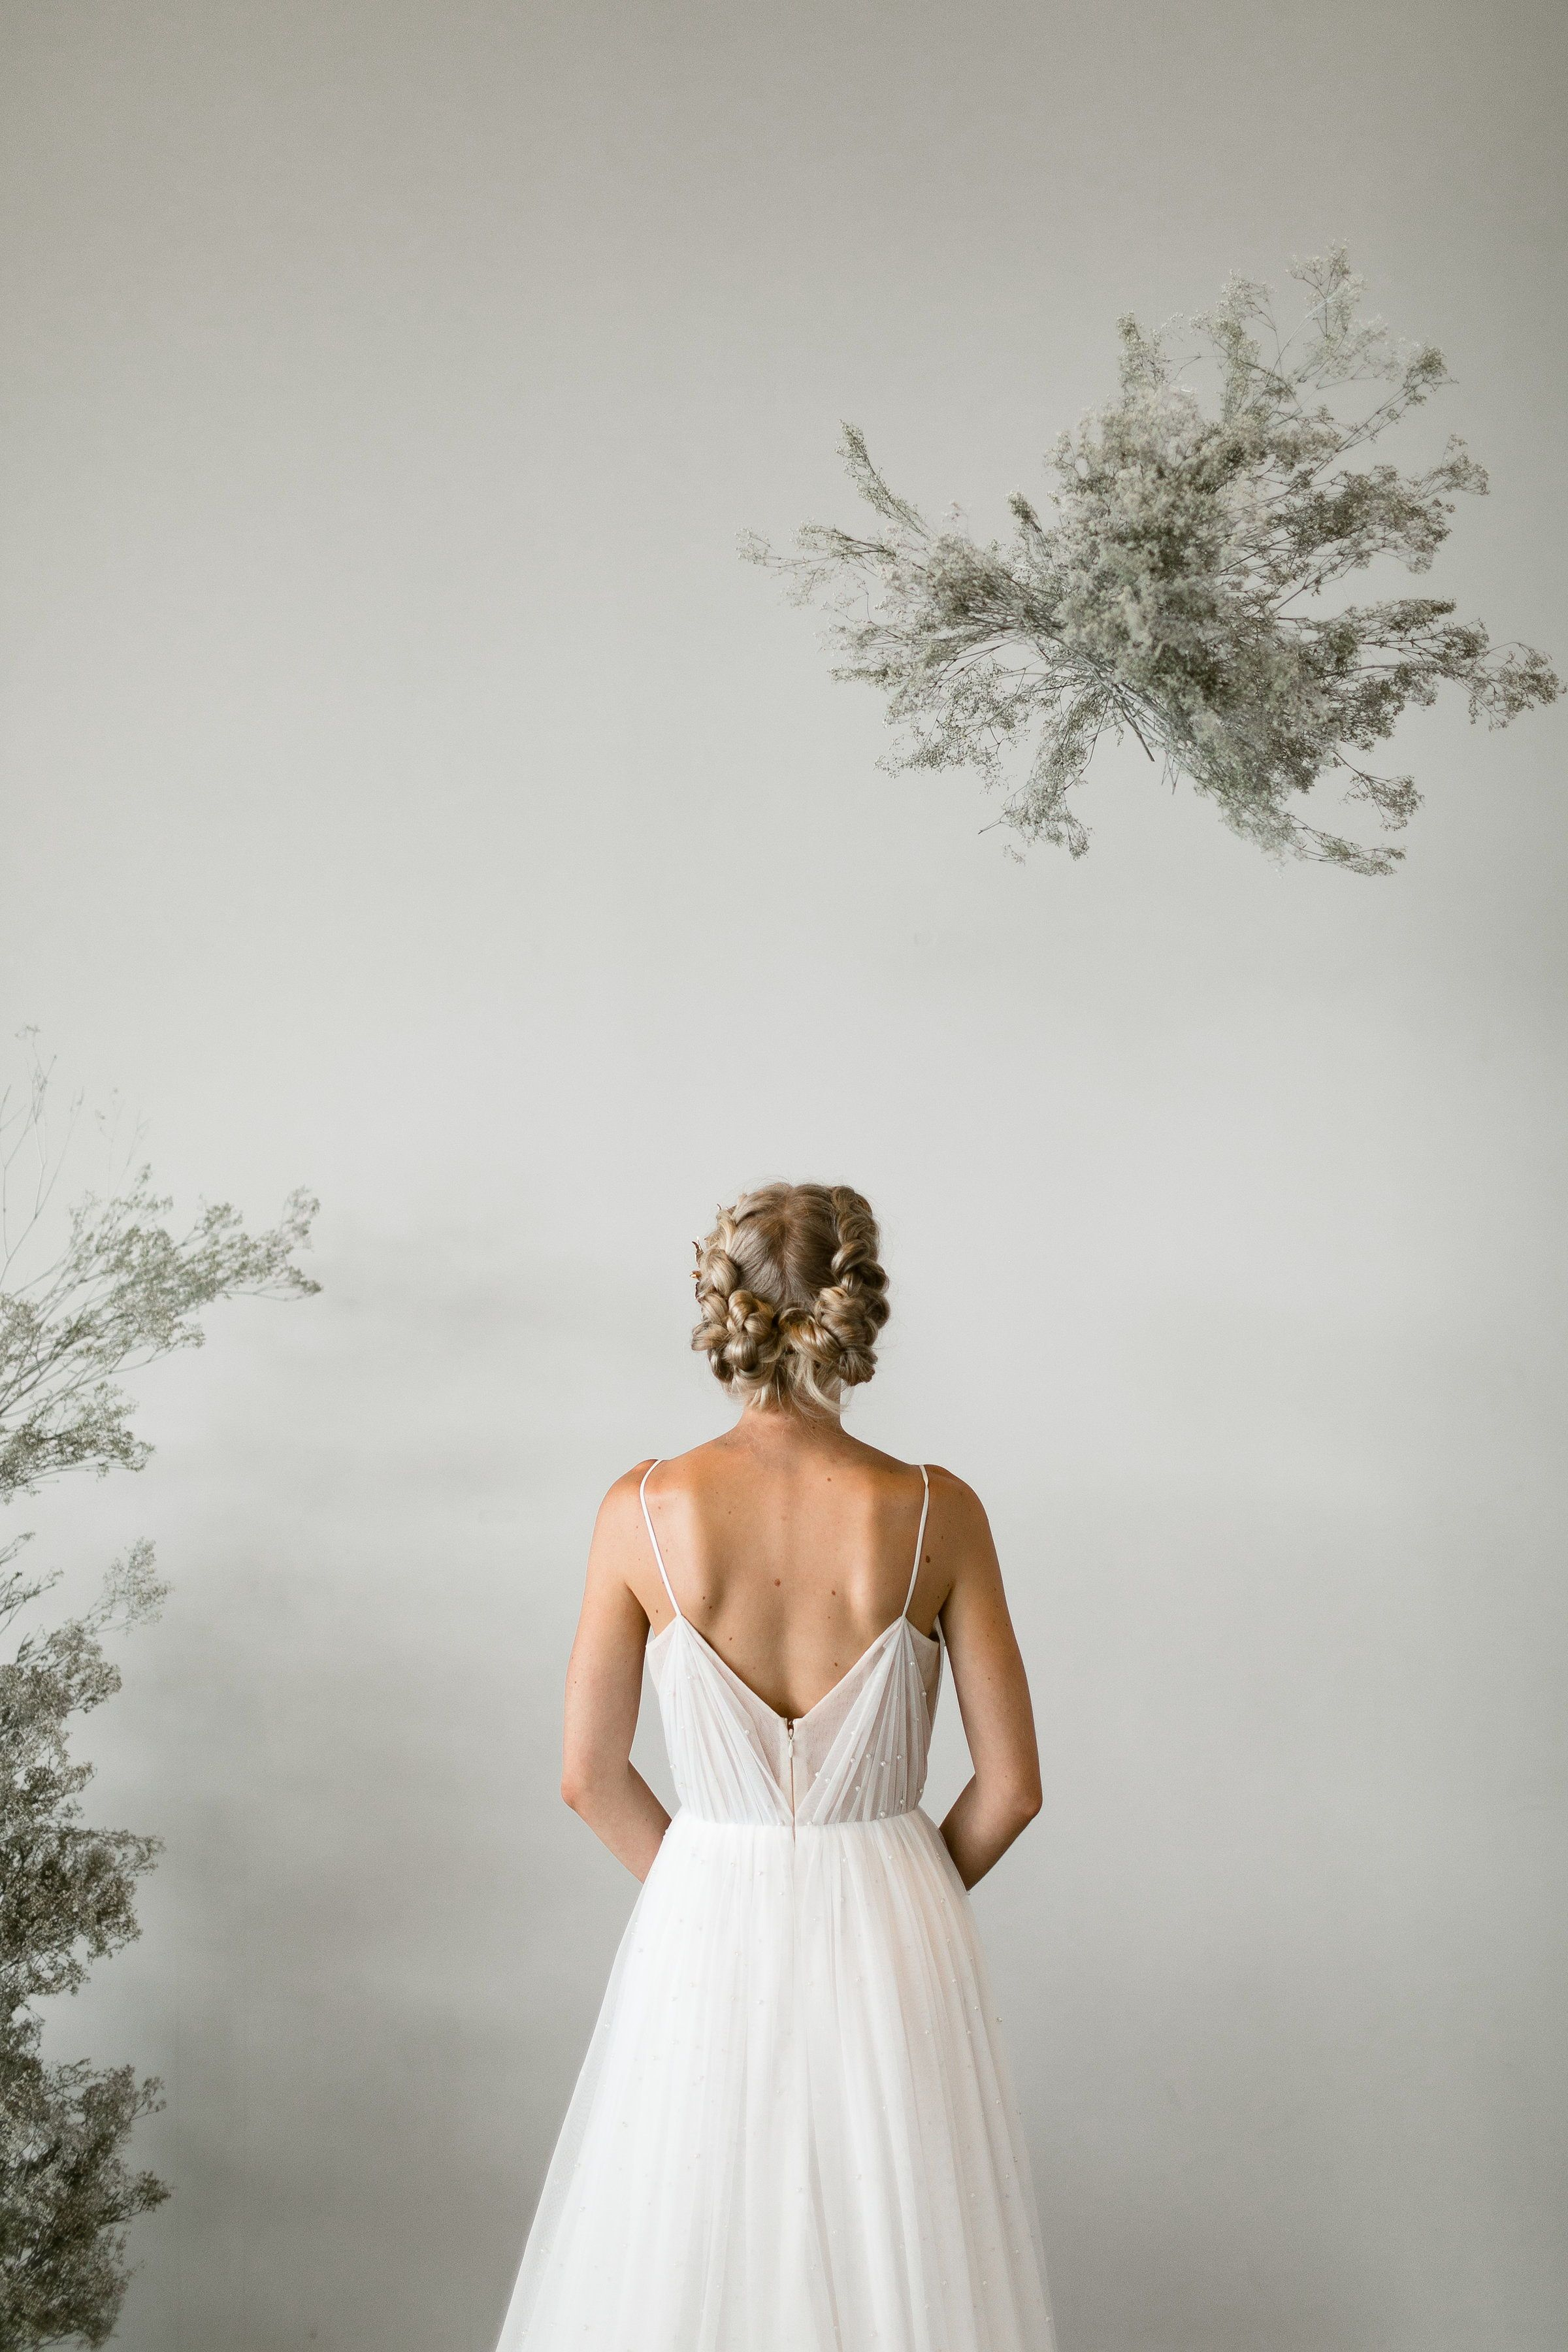 Simple modern wedding dress  Whittier  Tara Latour bridal Rose and Williams by Tara Latour